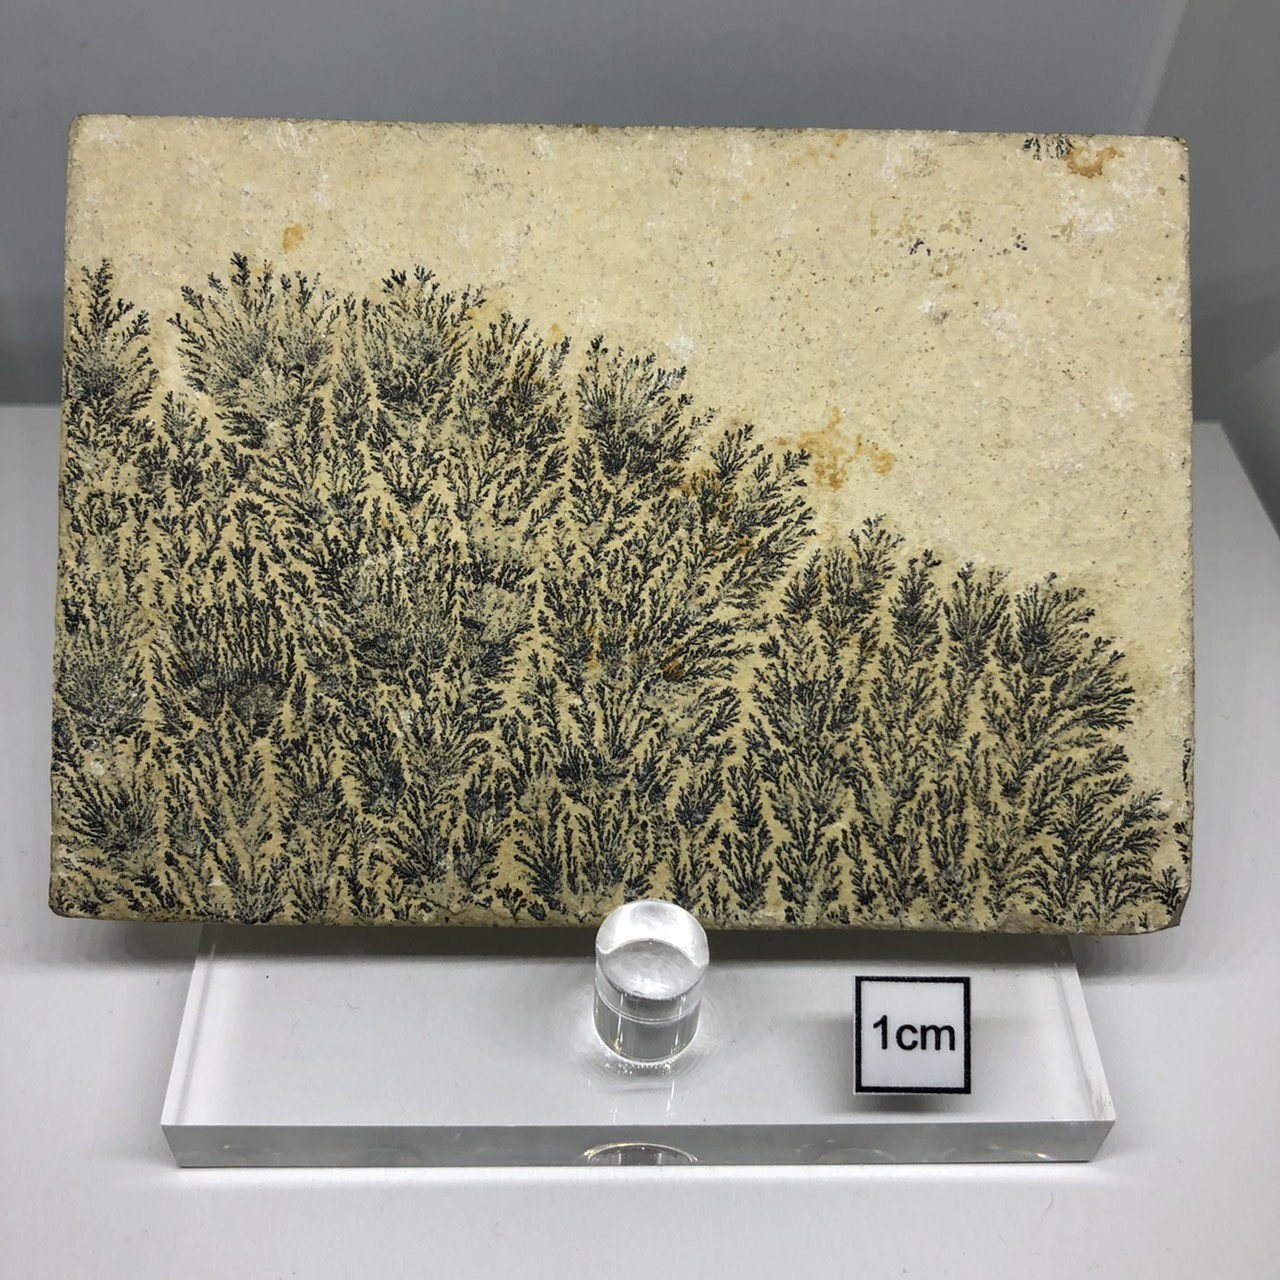 氧化錳樹枝石(Manganese Dendrites)